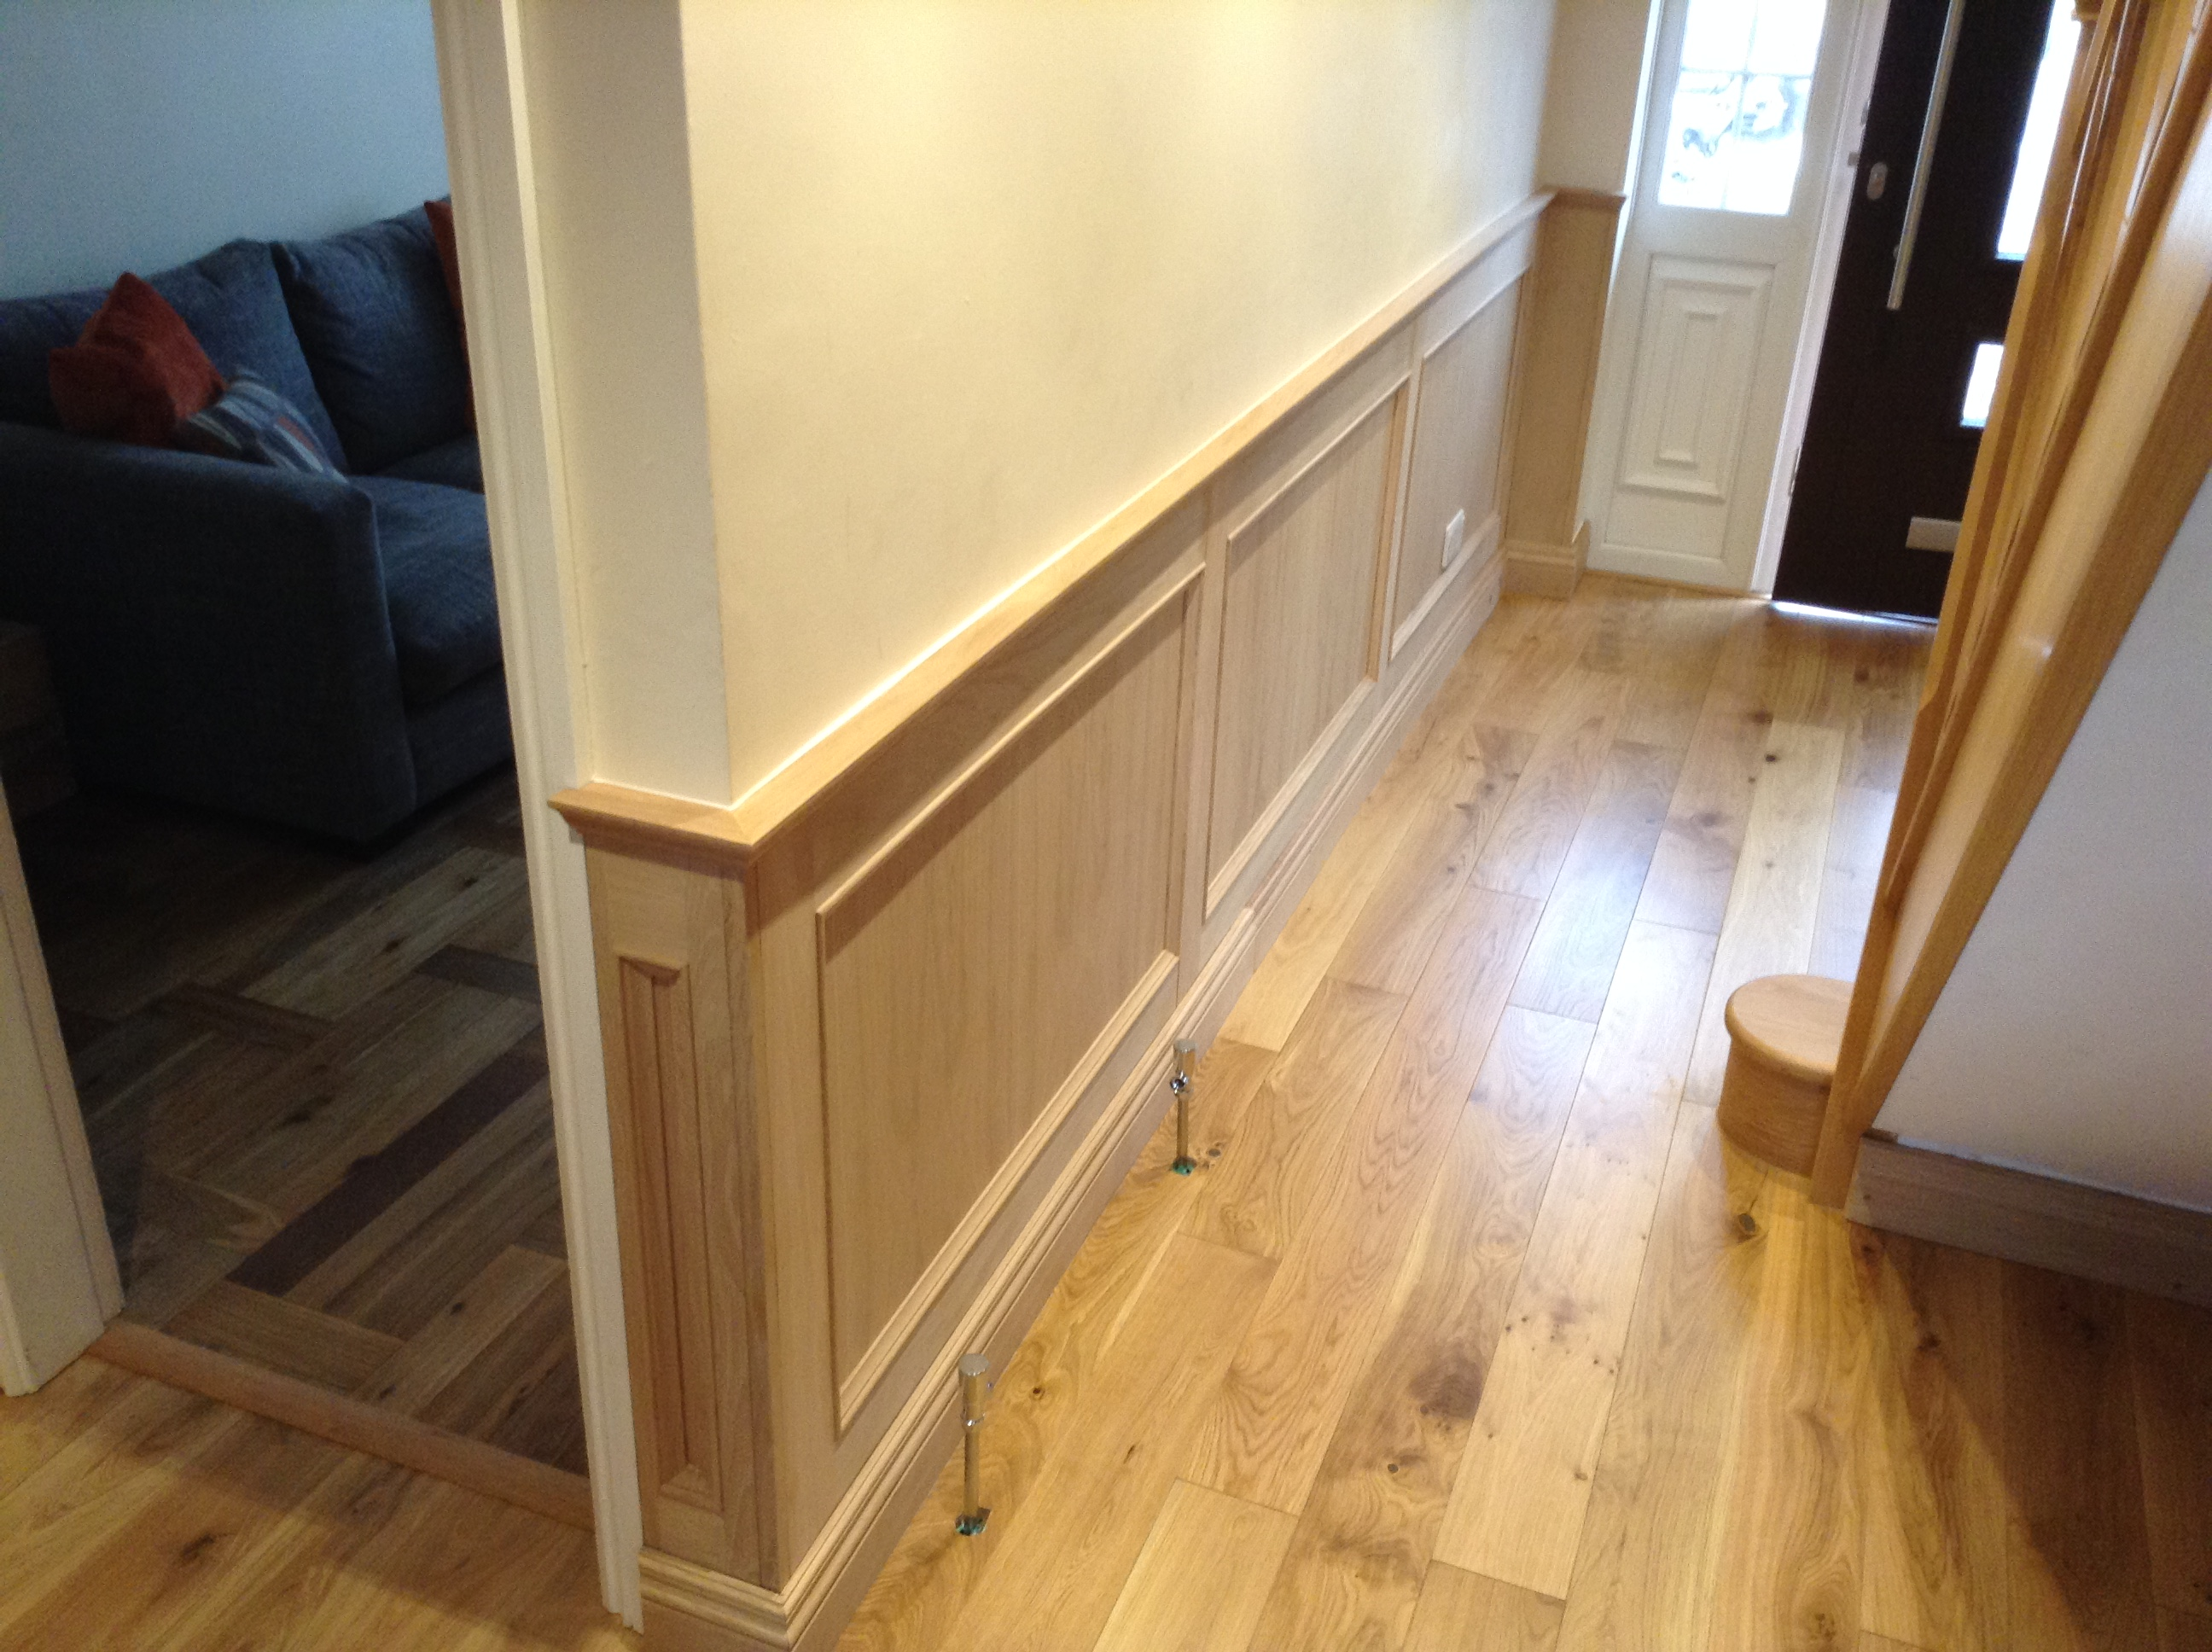 oak wall panelling decorative wood panelling wall panelling experts rh panelmaster co uk wooden panelling for walls uk wood paneling for walls uk